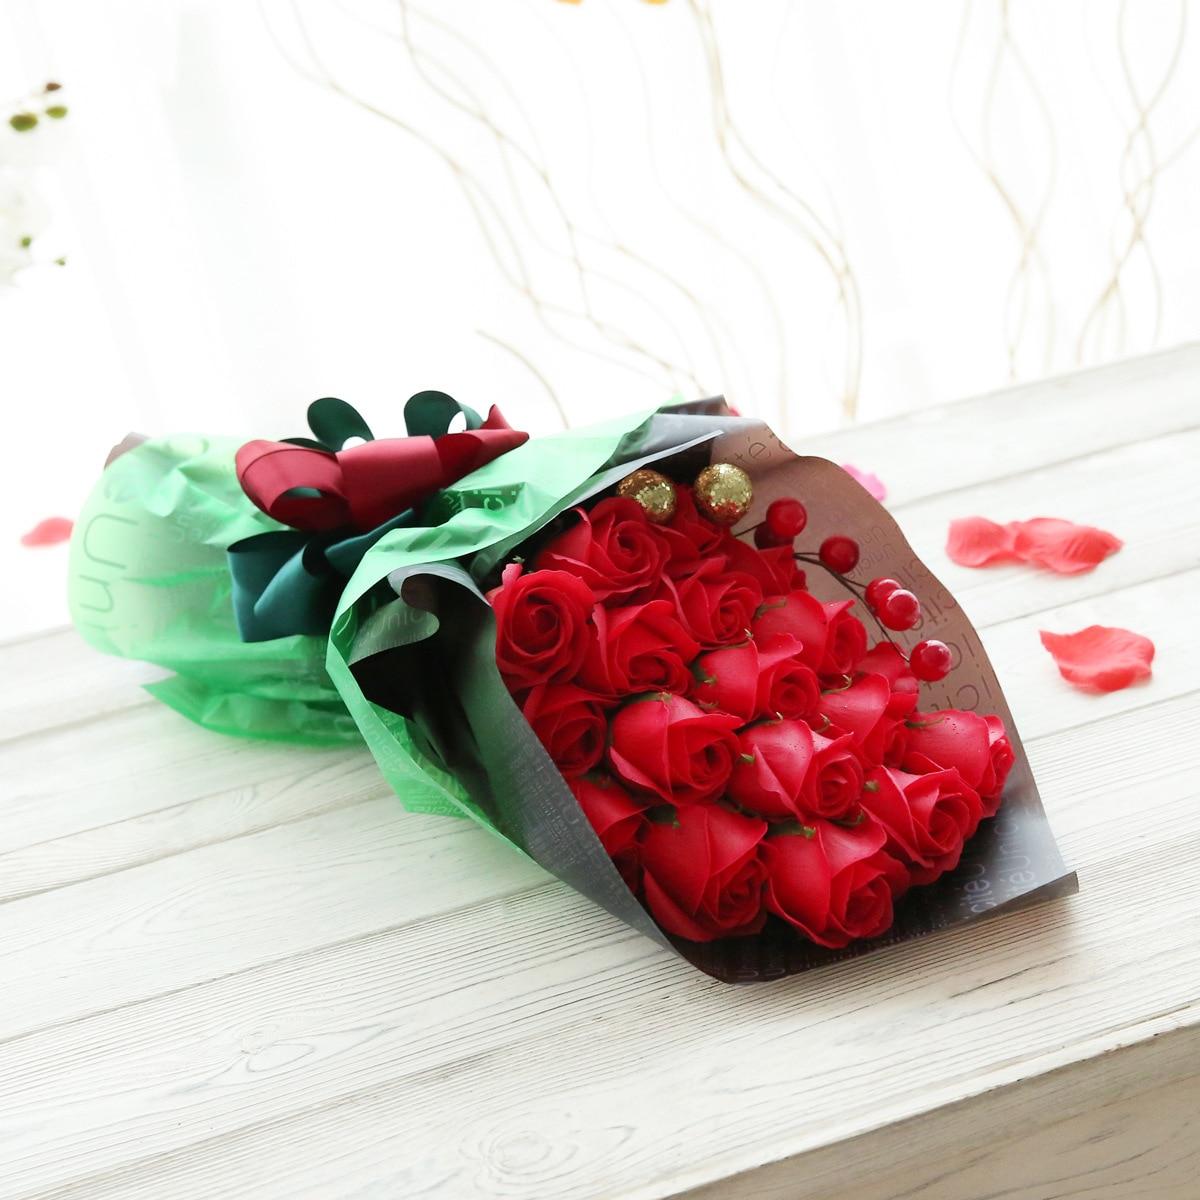 Soap flower teacher's Day gift teacher romantic girlfriend wife bestie practical Mid Autumn Festival Girl Birthday - 2